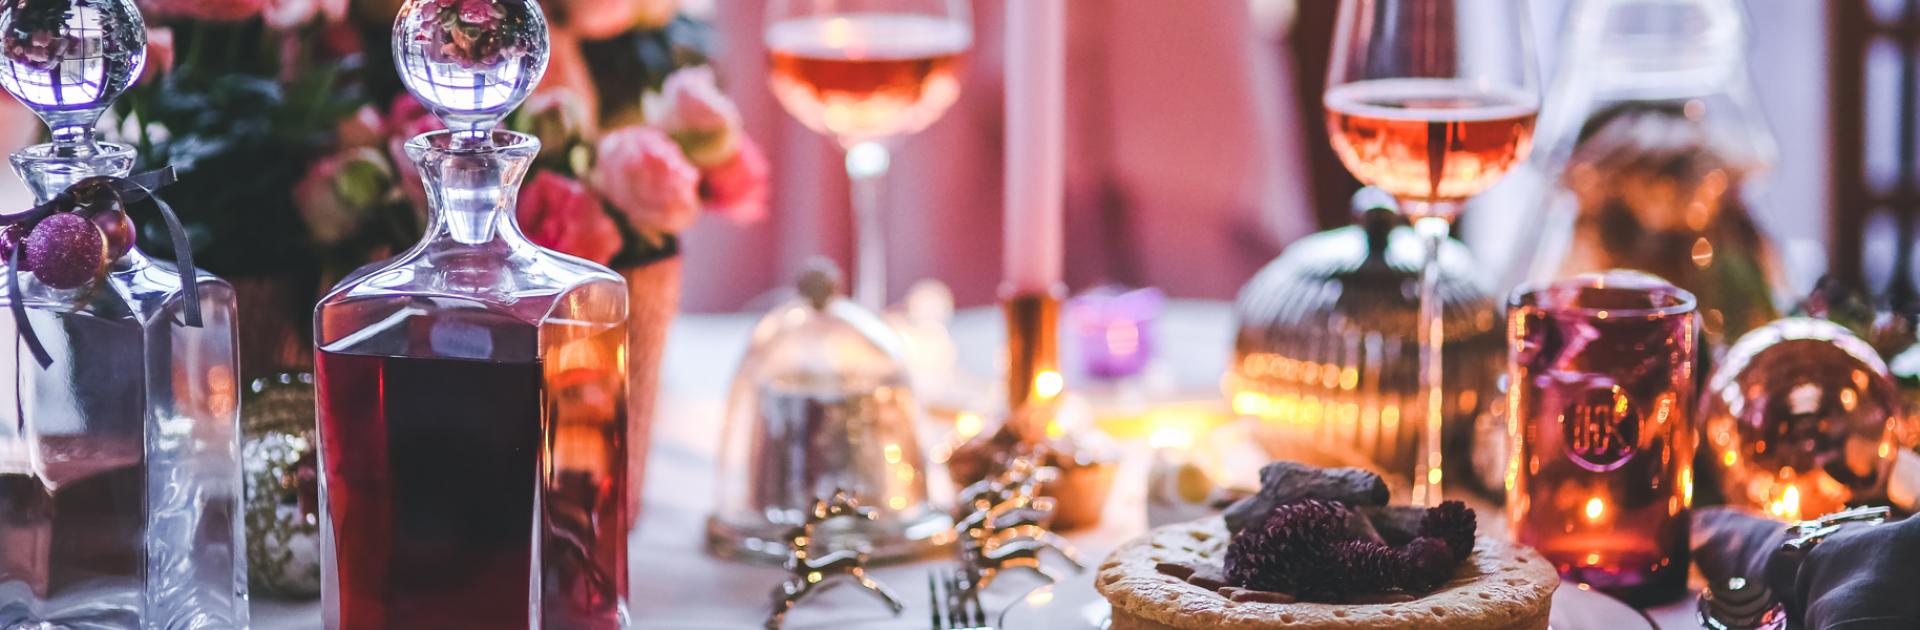 Kerstdiner | Eigenhuis Keukenserstdiner